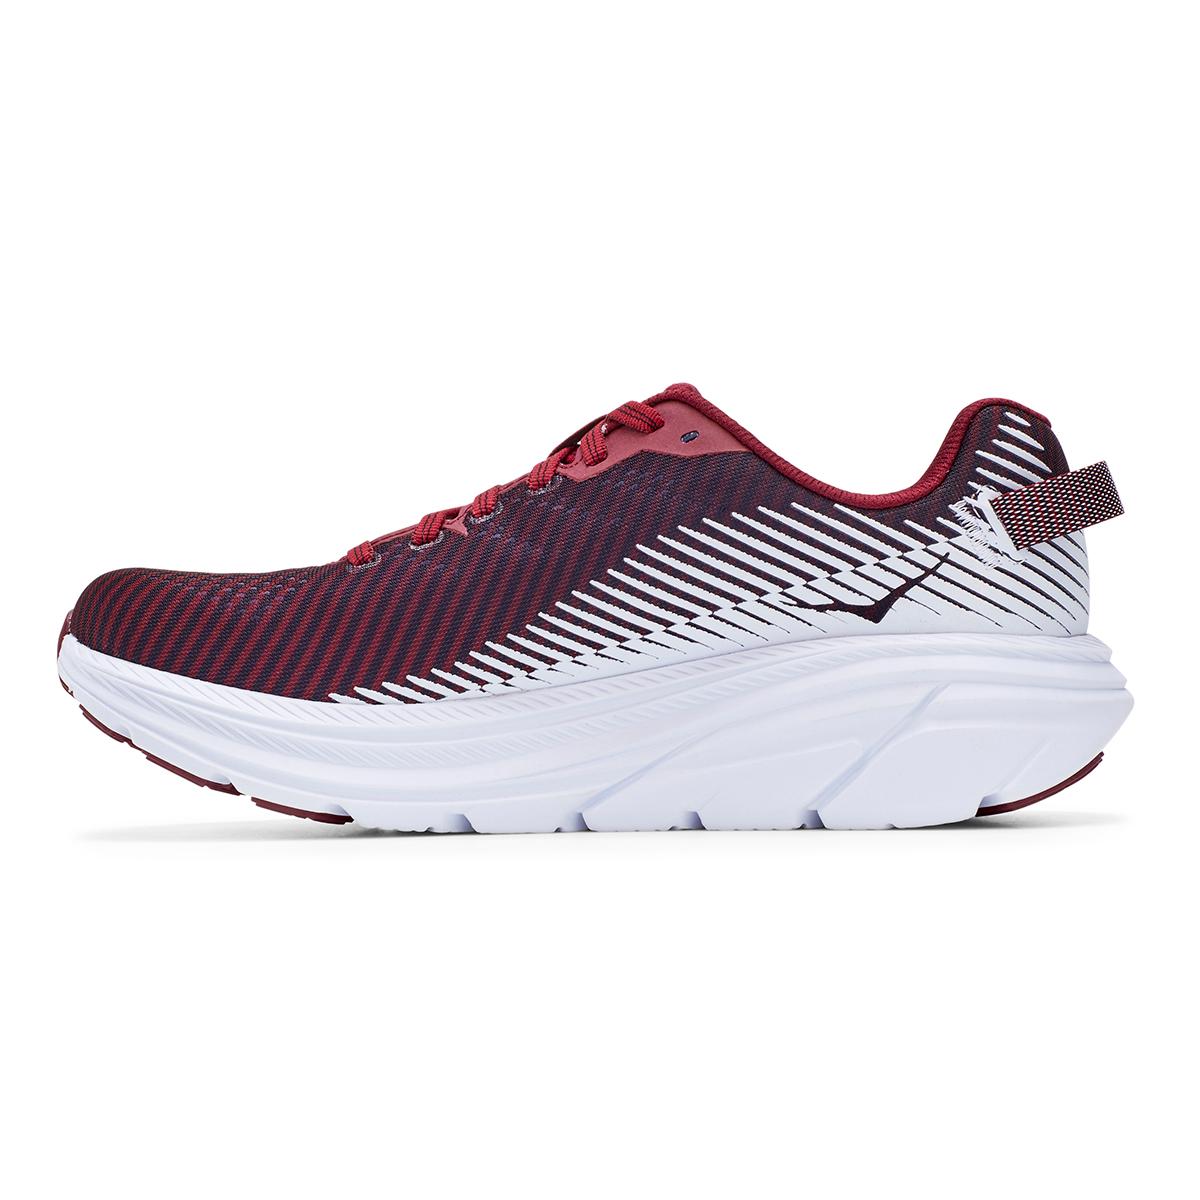 Women's Hoka One One Rincon 2 Running Shoe - Color: Cordovan/White - Size: 5 - Width: Regular, Cordovan/White, large, image 6